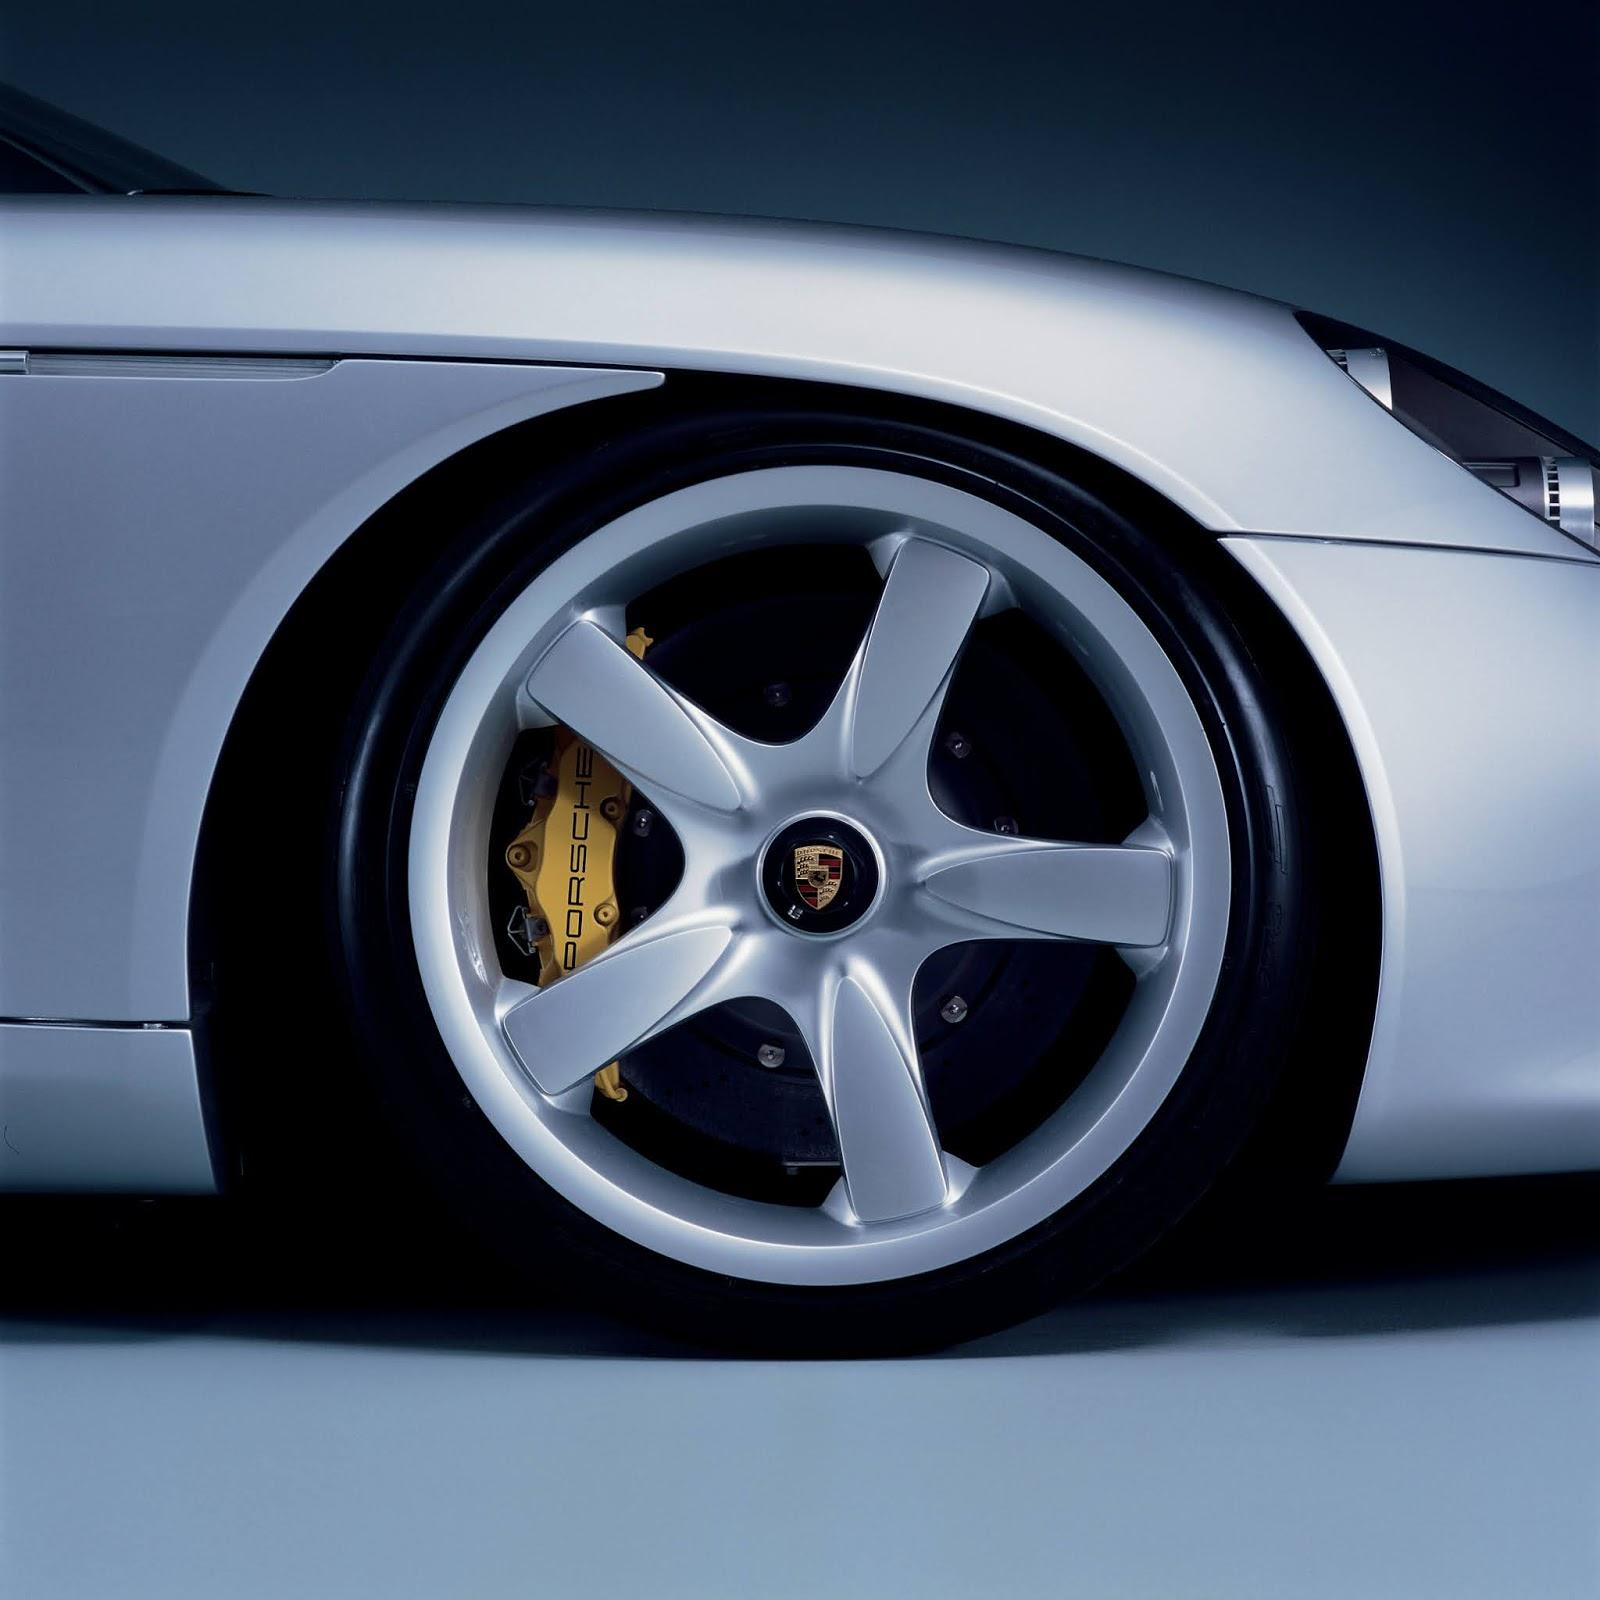 P01 0391 a4 Porsche Carrera GT : Ένα αγωνιστικό LeMans, για το δρόμο Carrera GT, Porsche, Porsche Carrera GT, retrocar, retrocar sunday, supercar, zblog